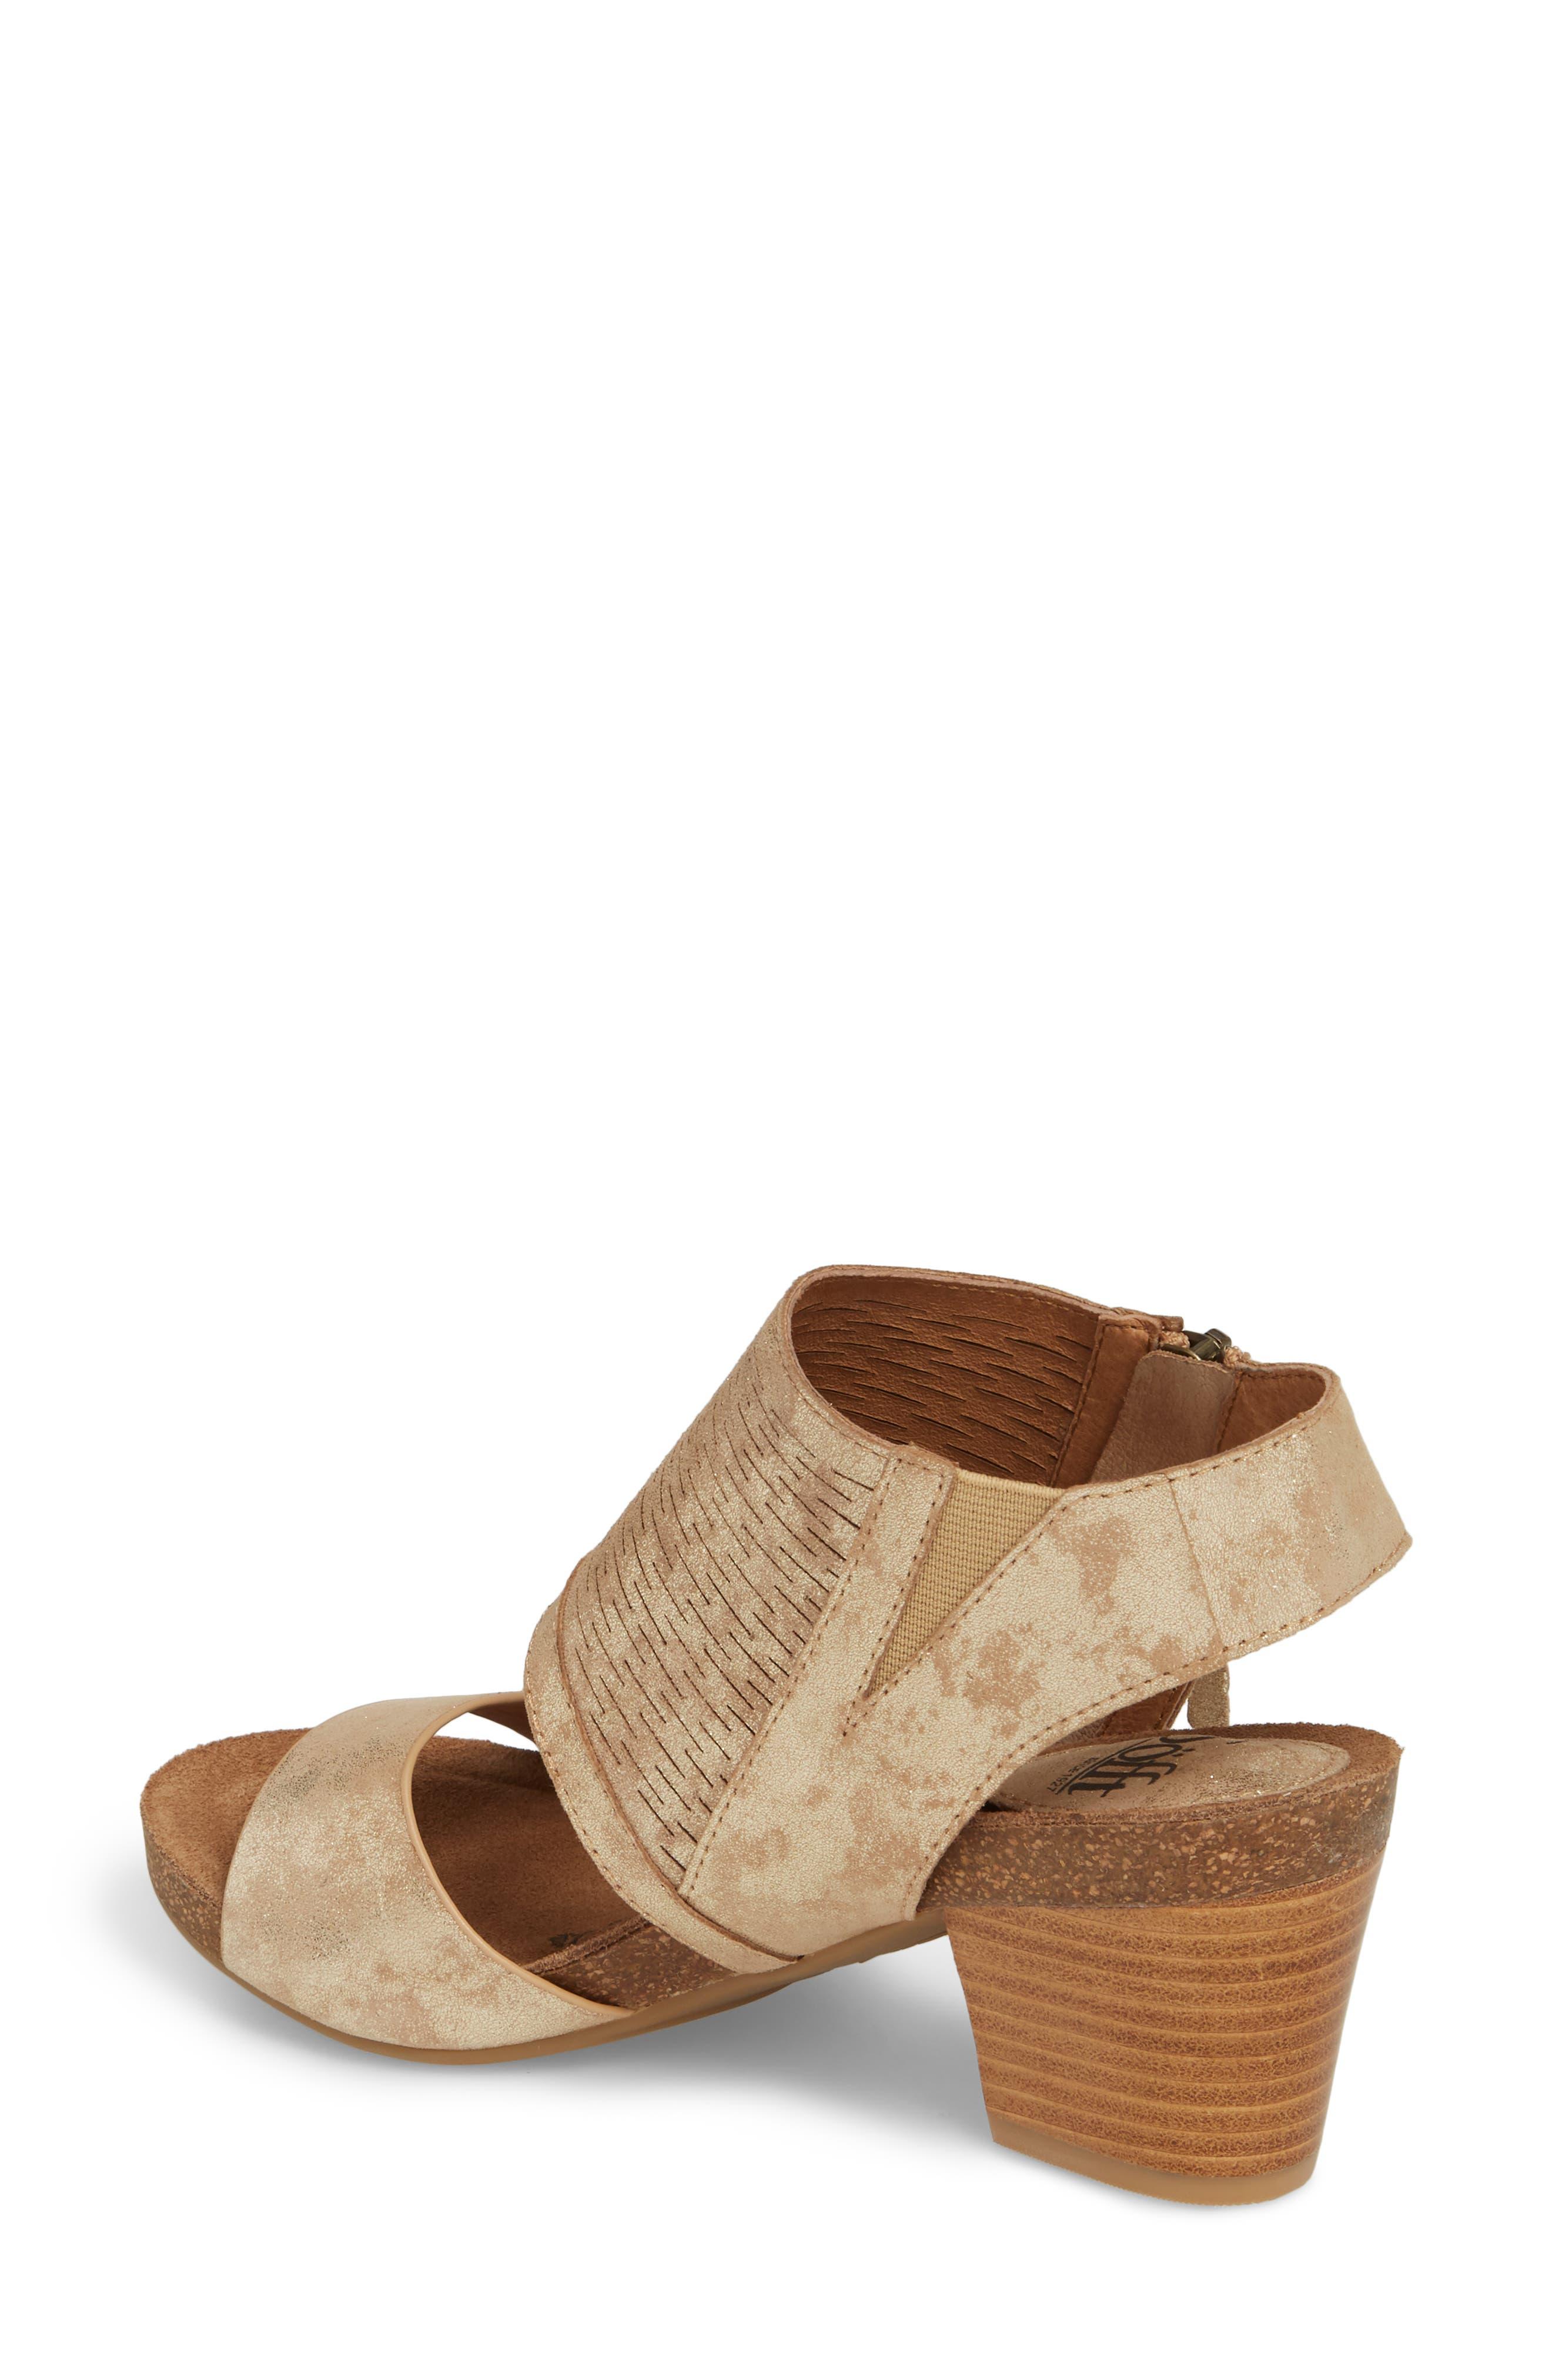 Milan Block Heel Sandal,                             Alternate thumbnail 2, color,                             040